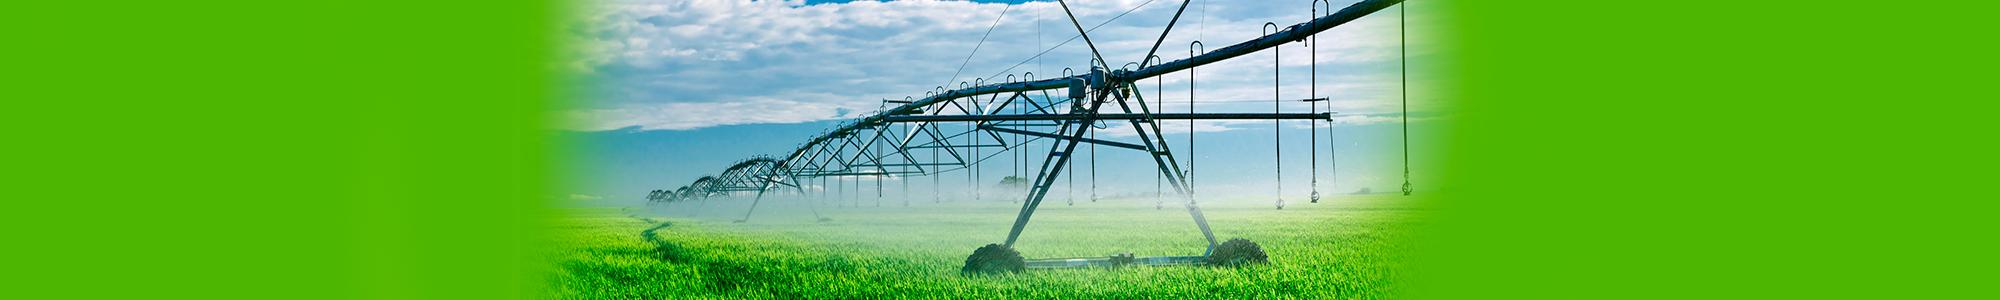 Farm Irrigation from Rainwater Harvesting